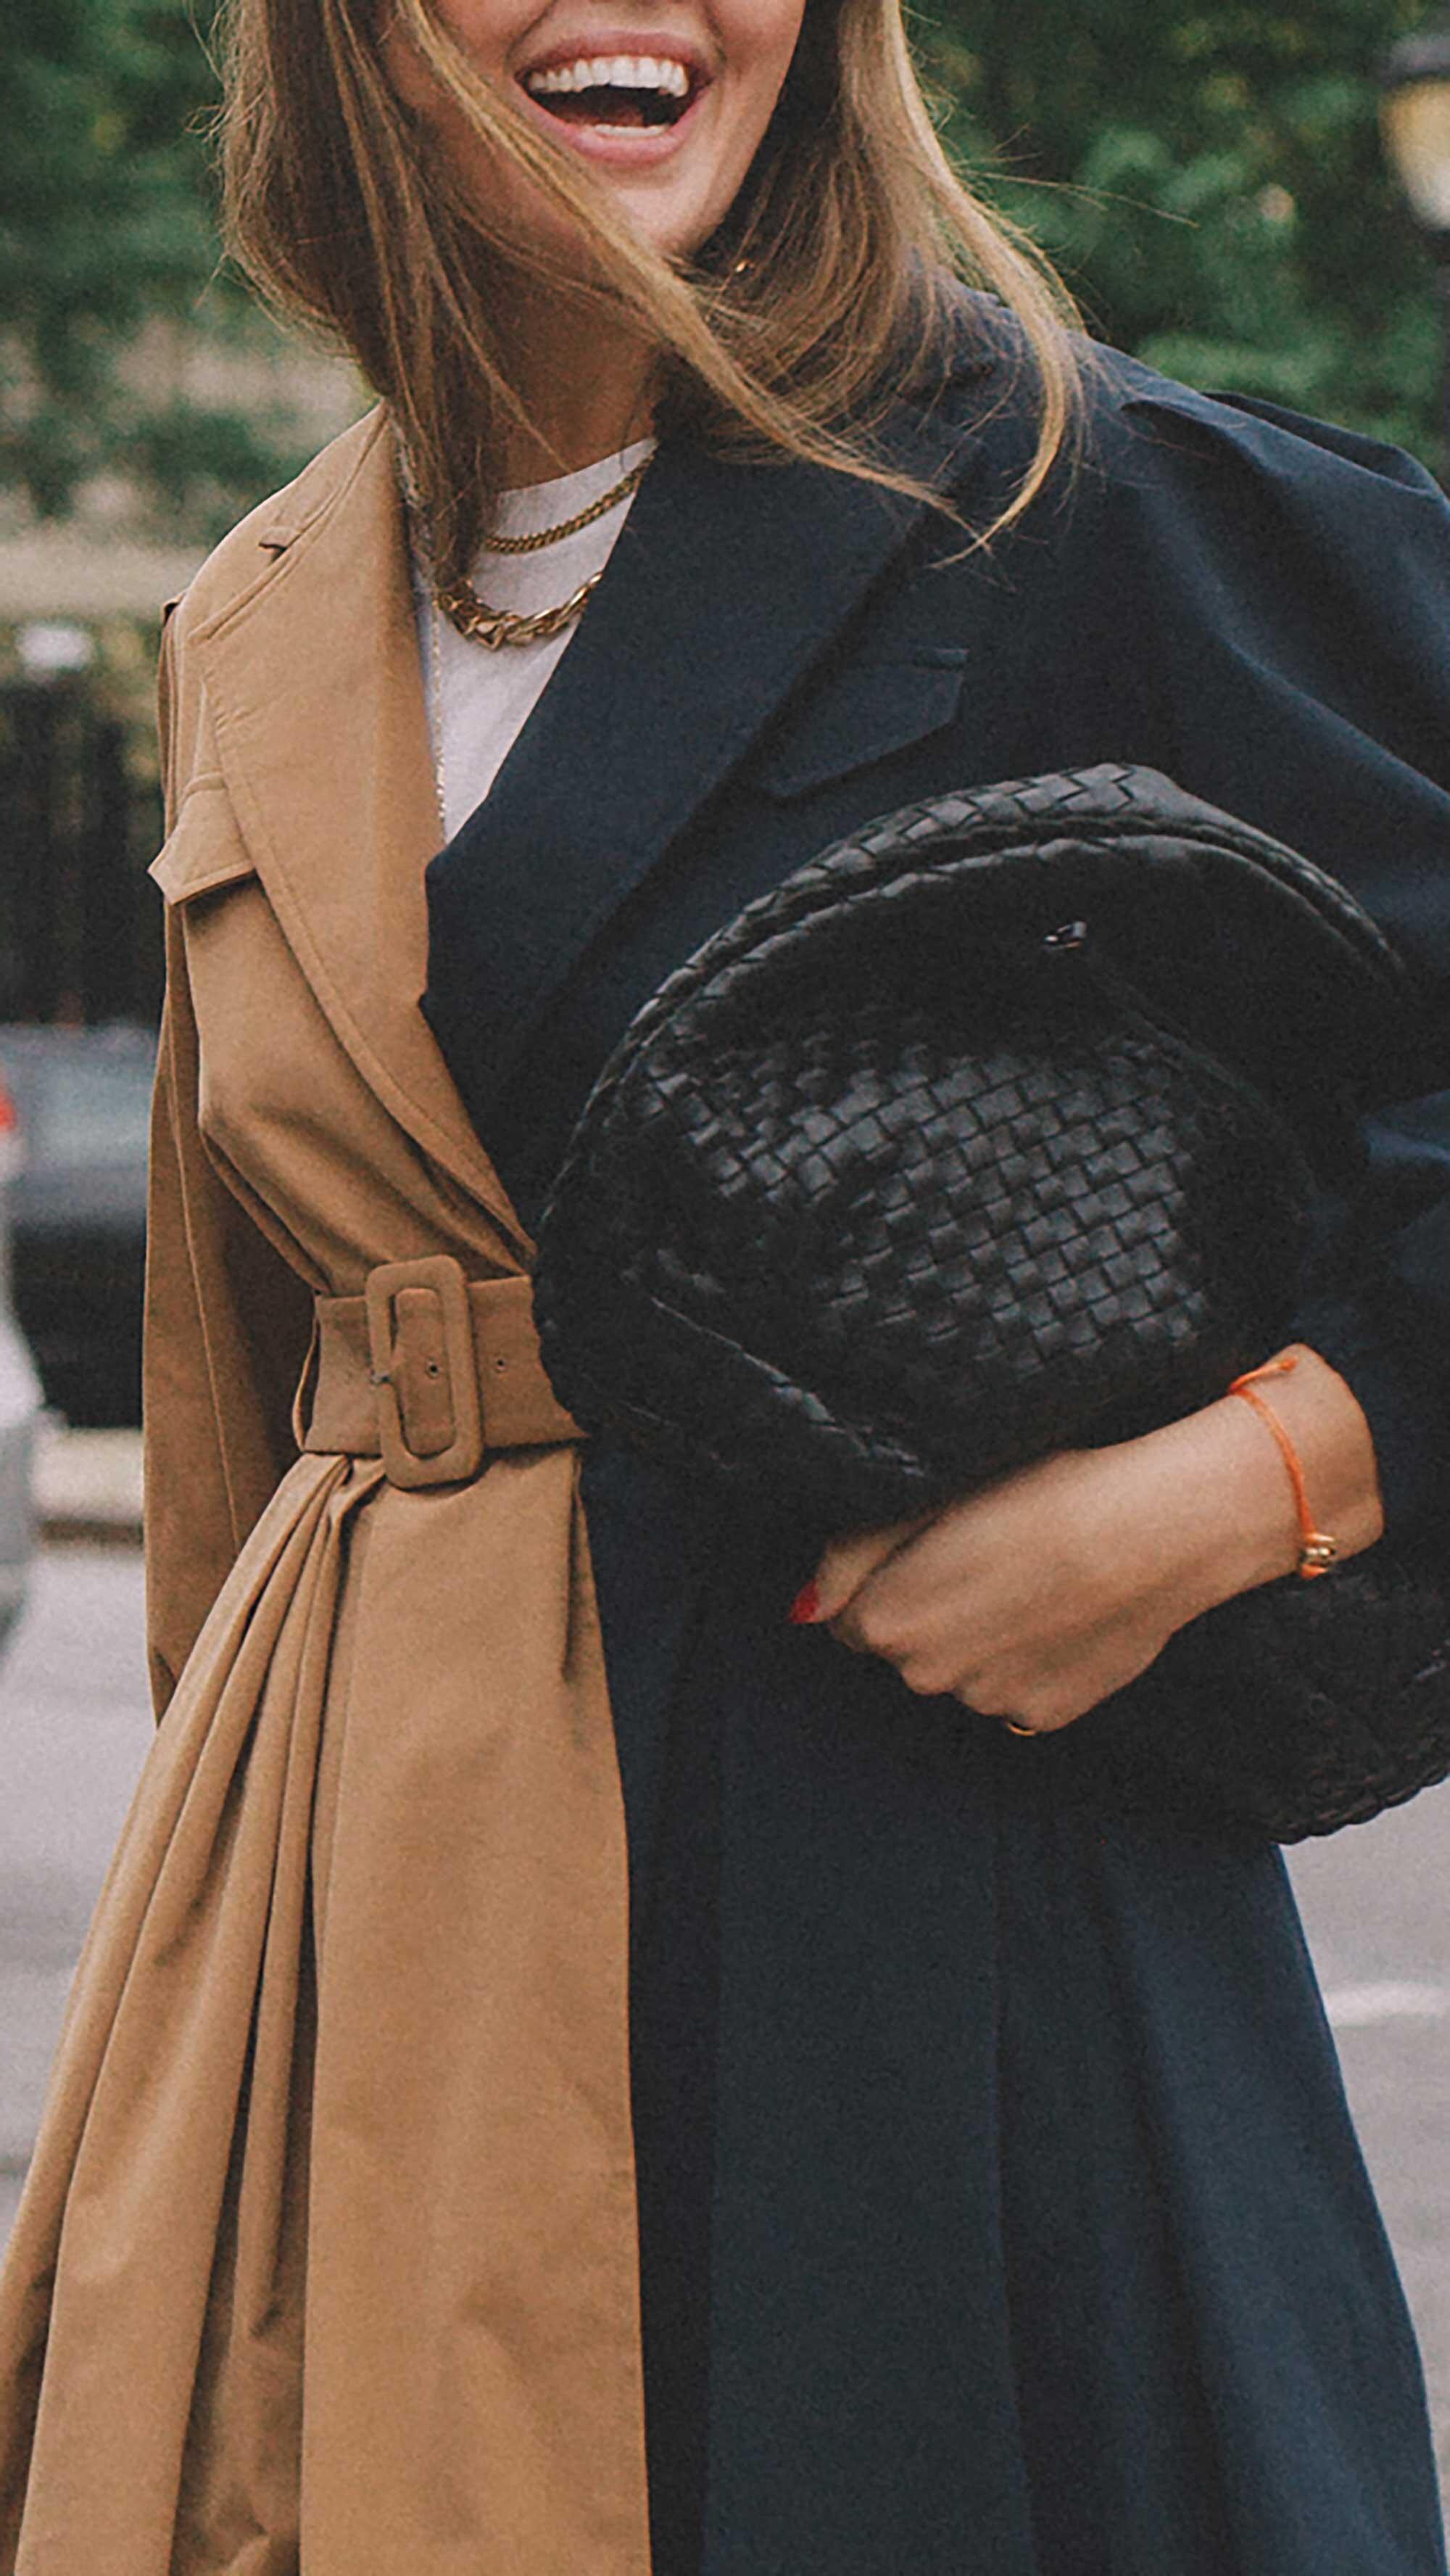 3. Bottega Veneta - Veneta large intrecciato leather shoulder bag